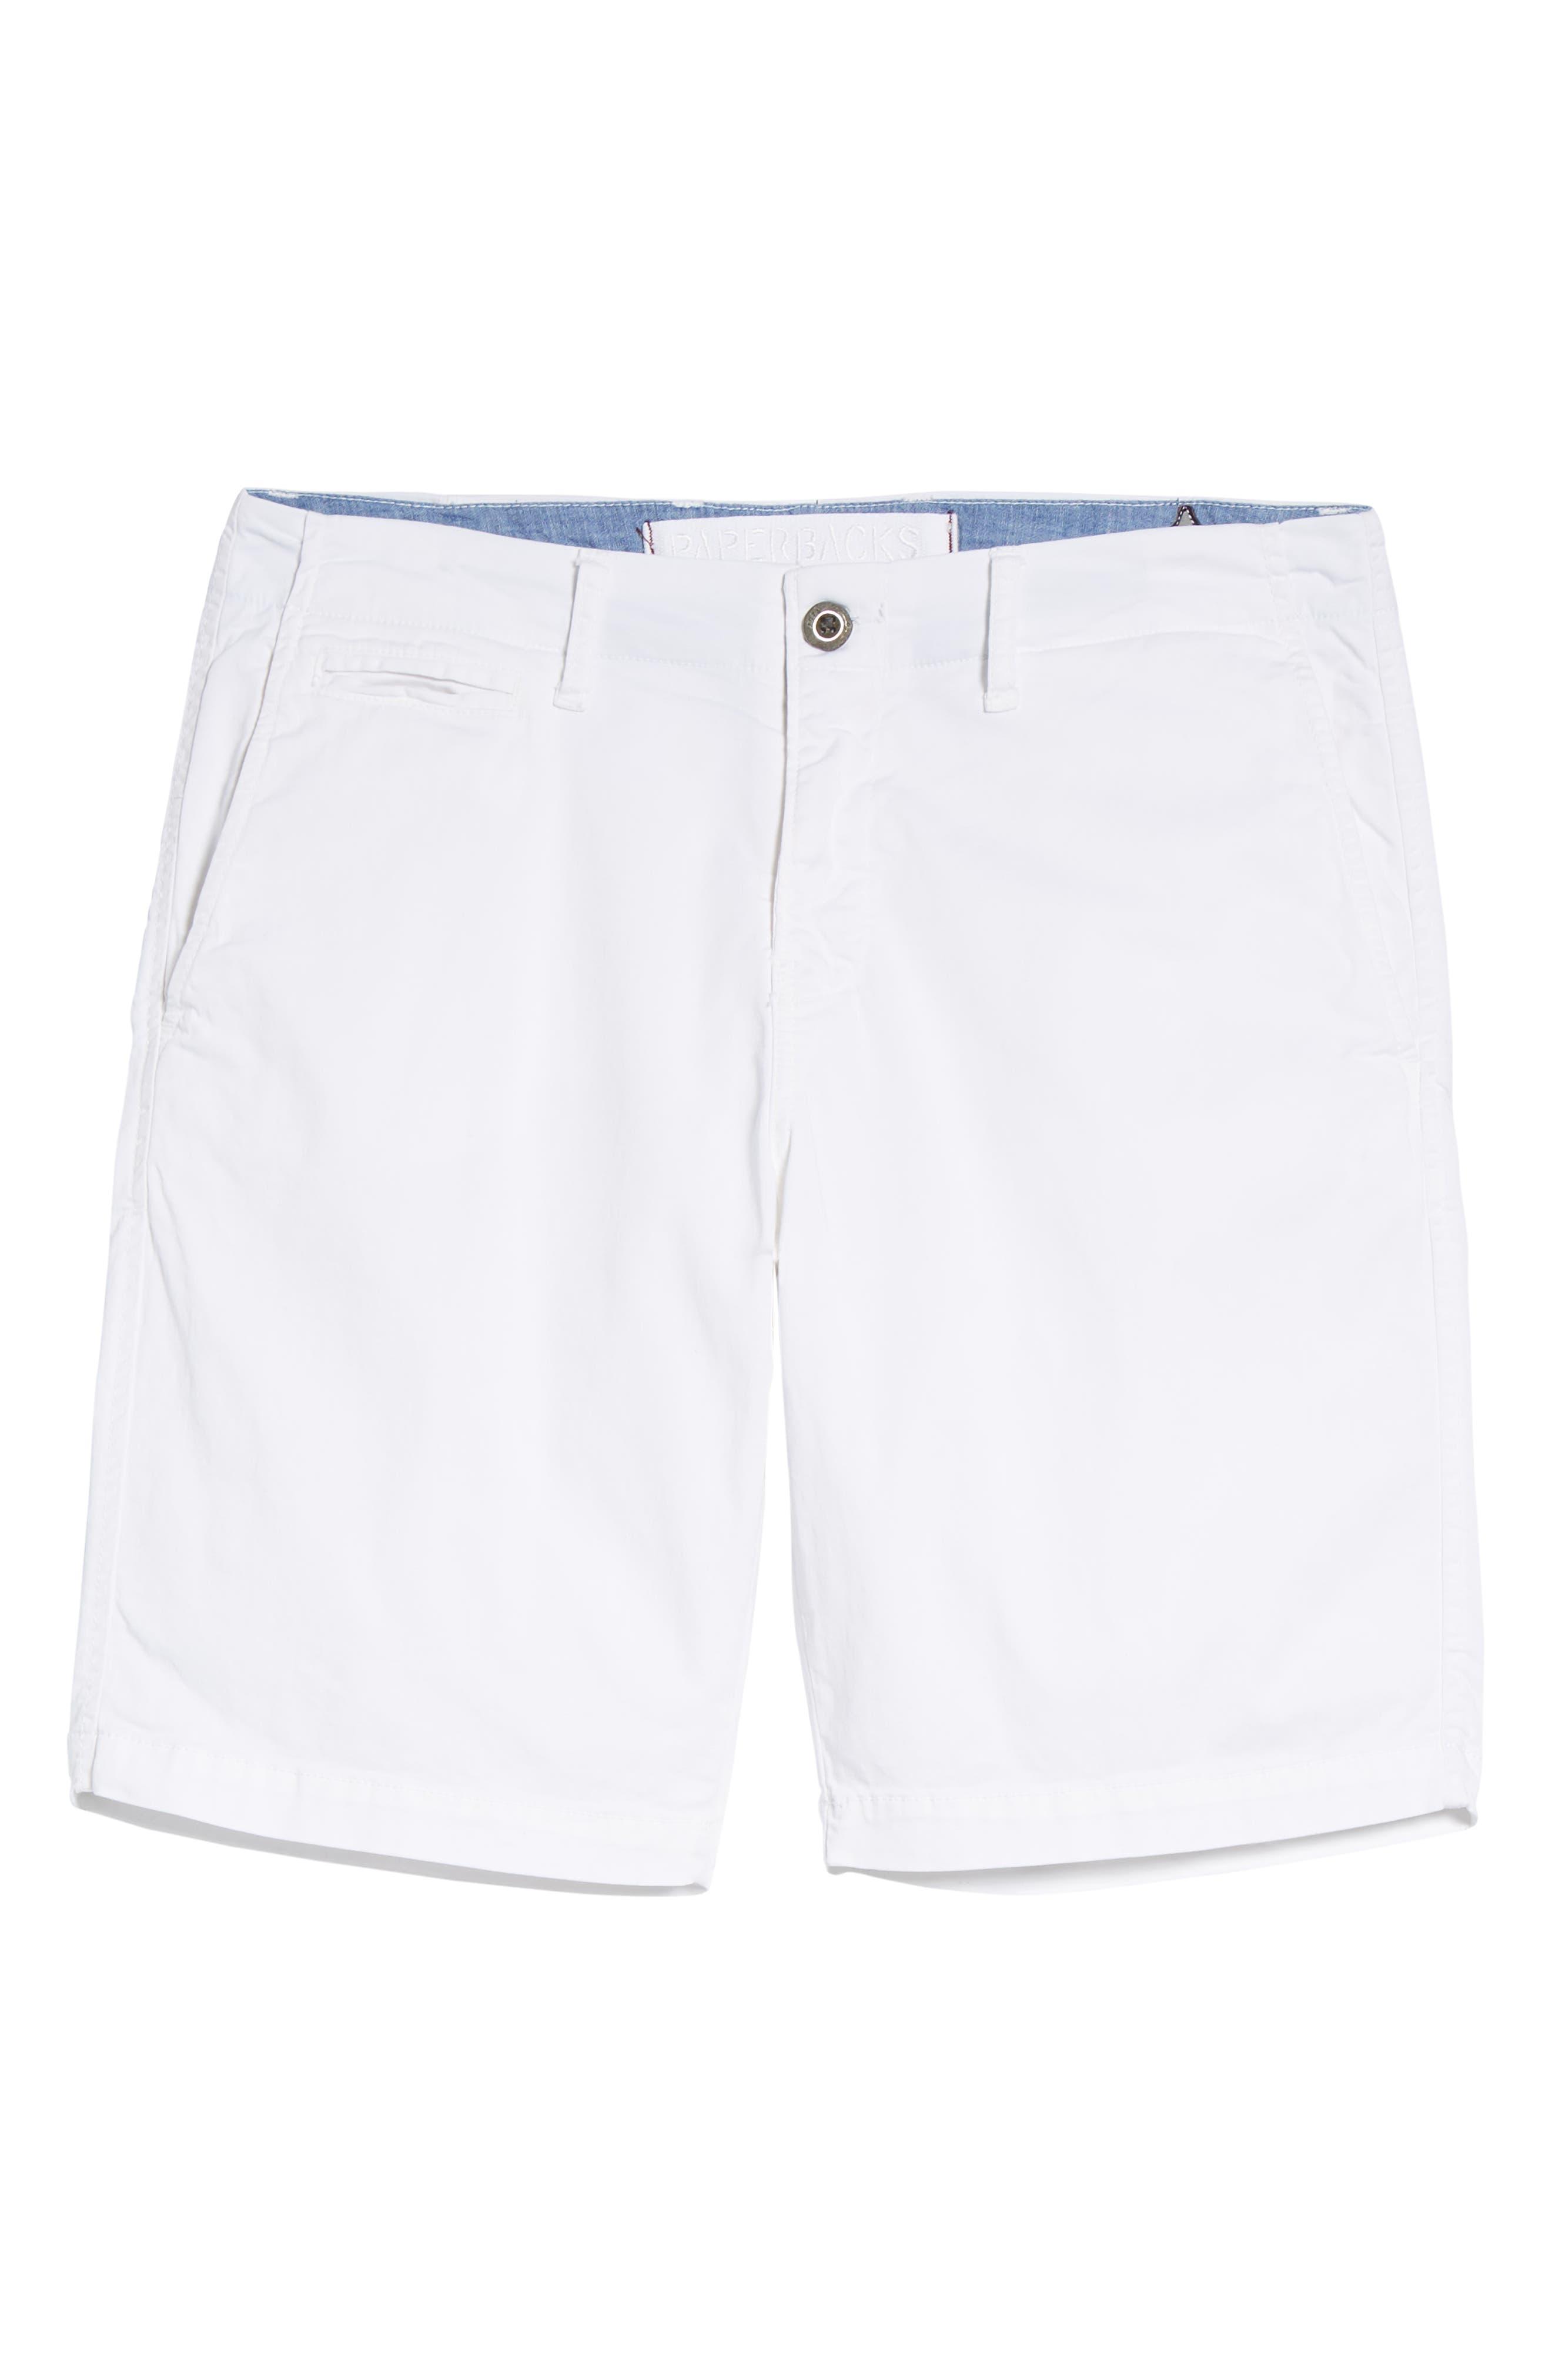 St. Barts Twill Shorts,                             Alternate thumbnail 65, color,